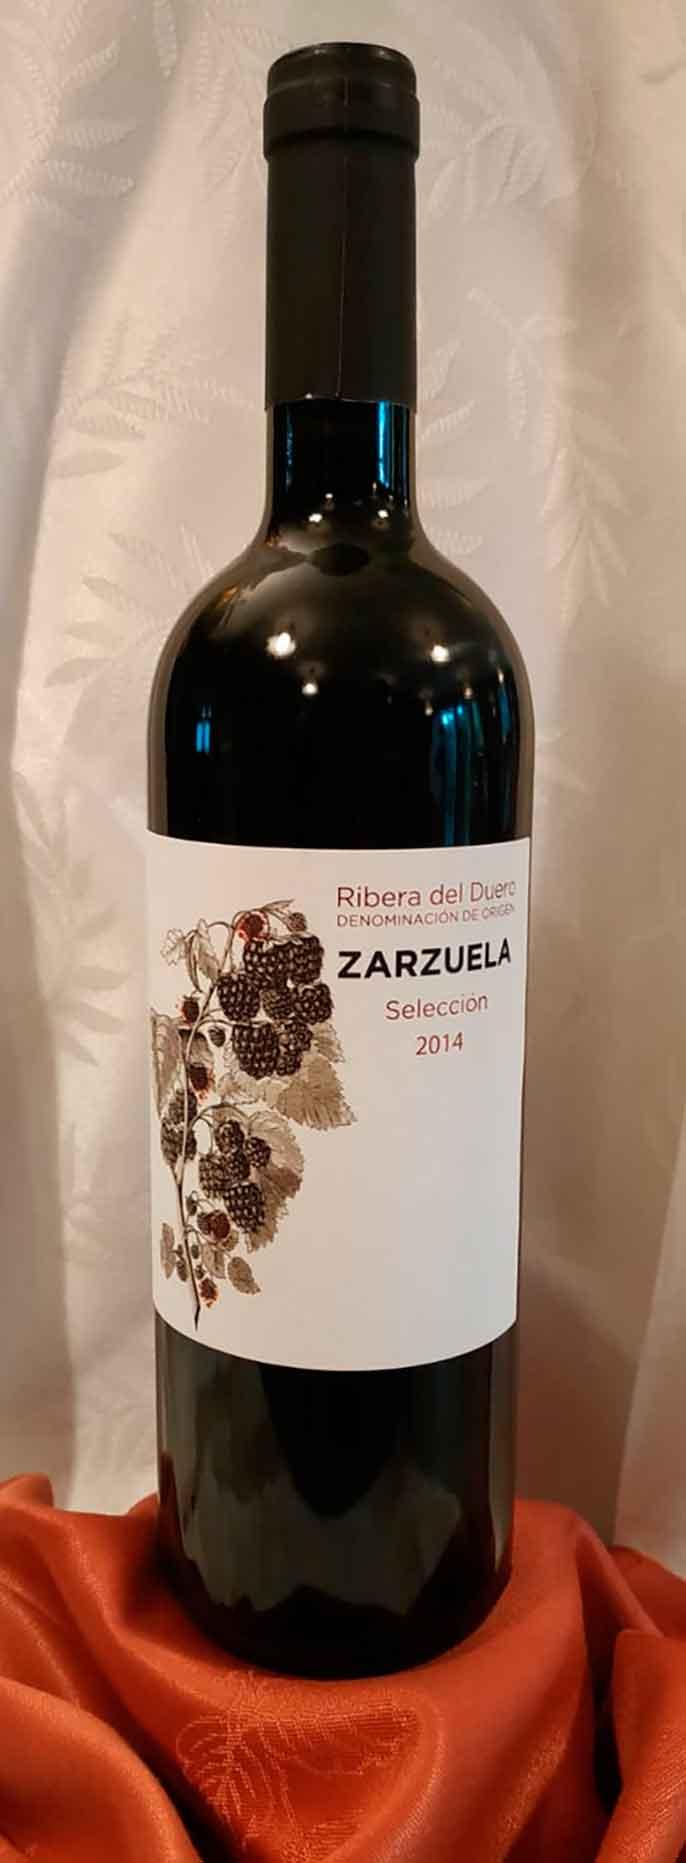 Zarzuela - Ribera del Duero